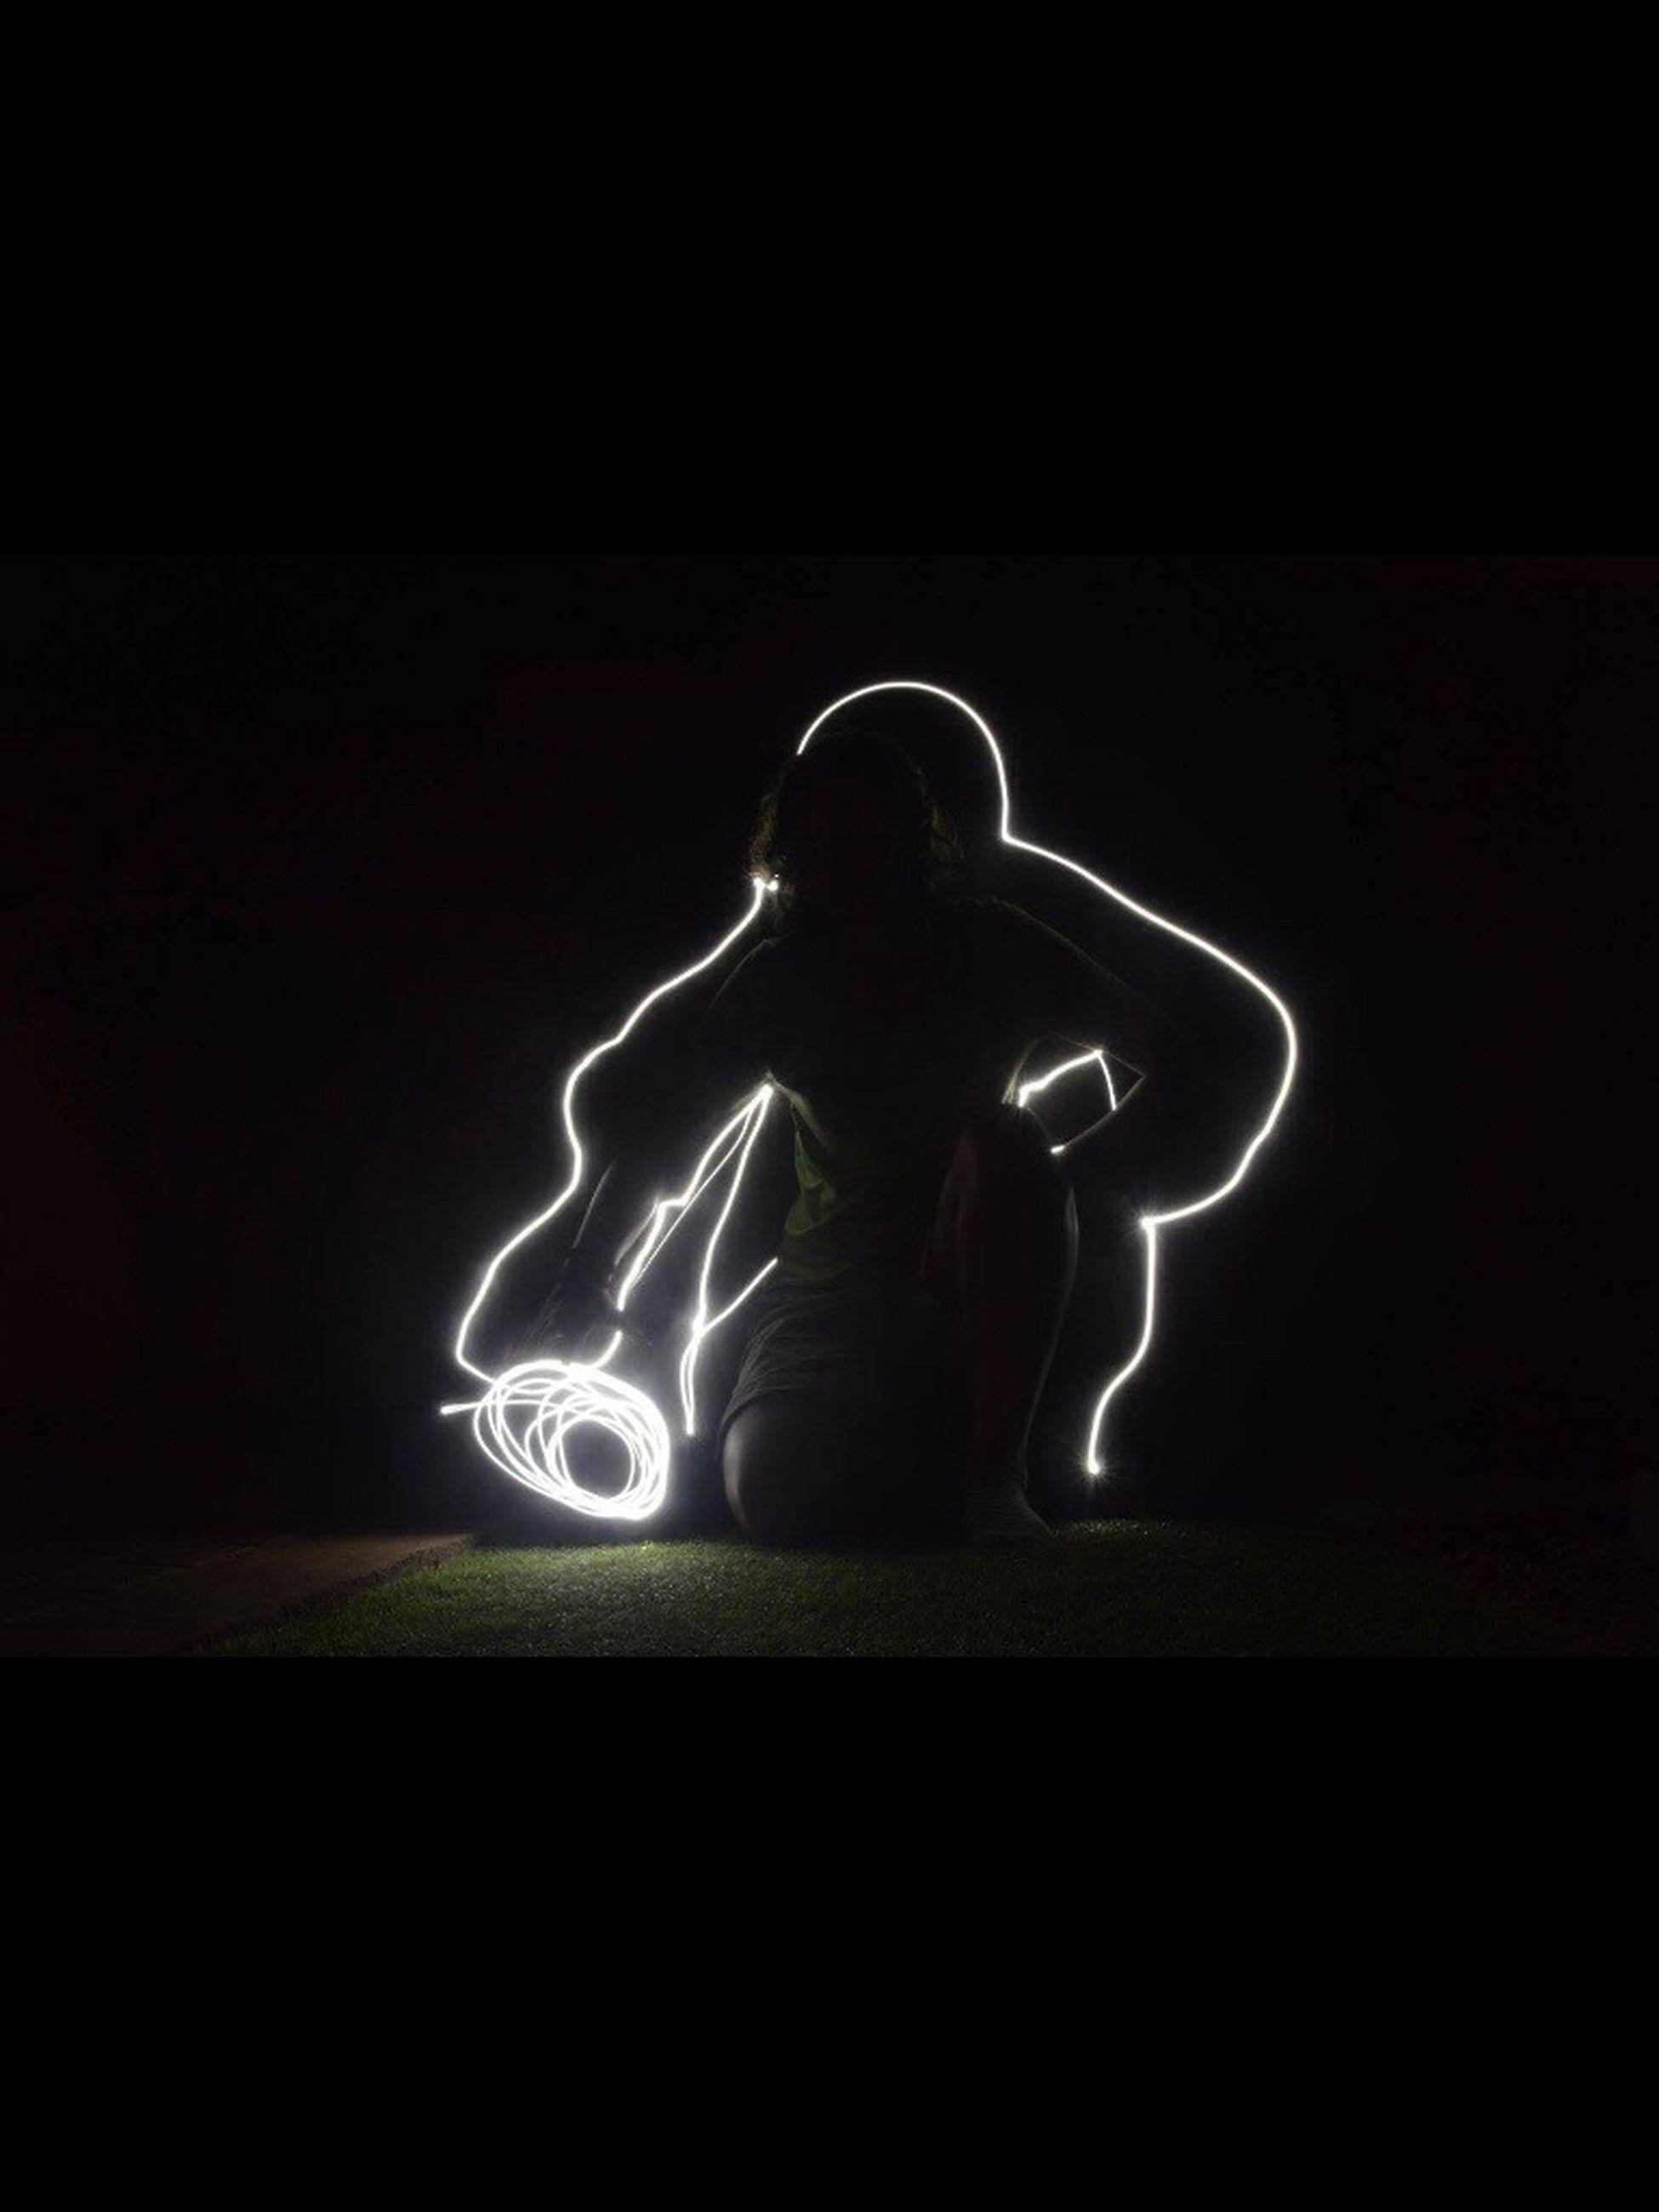 illuminated, night, long exposure, light painting, creativity, performance, dark